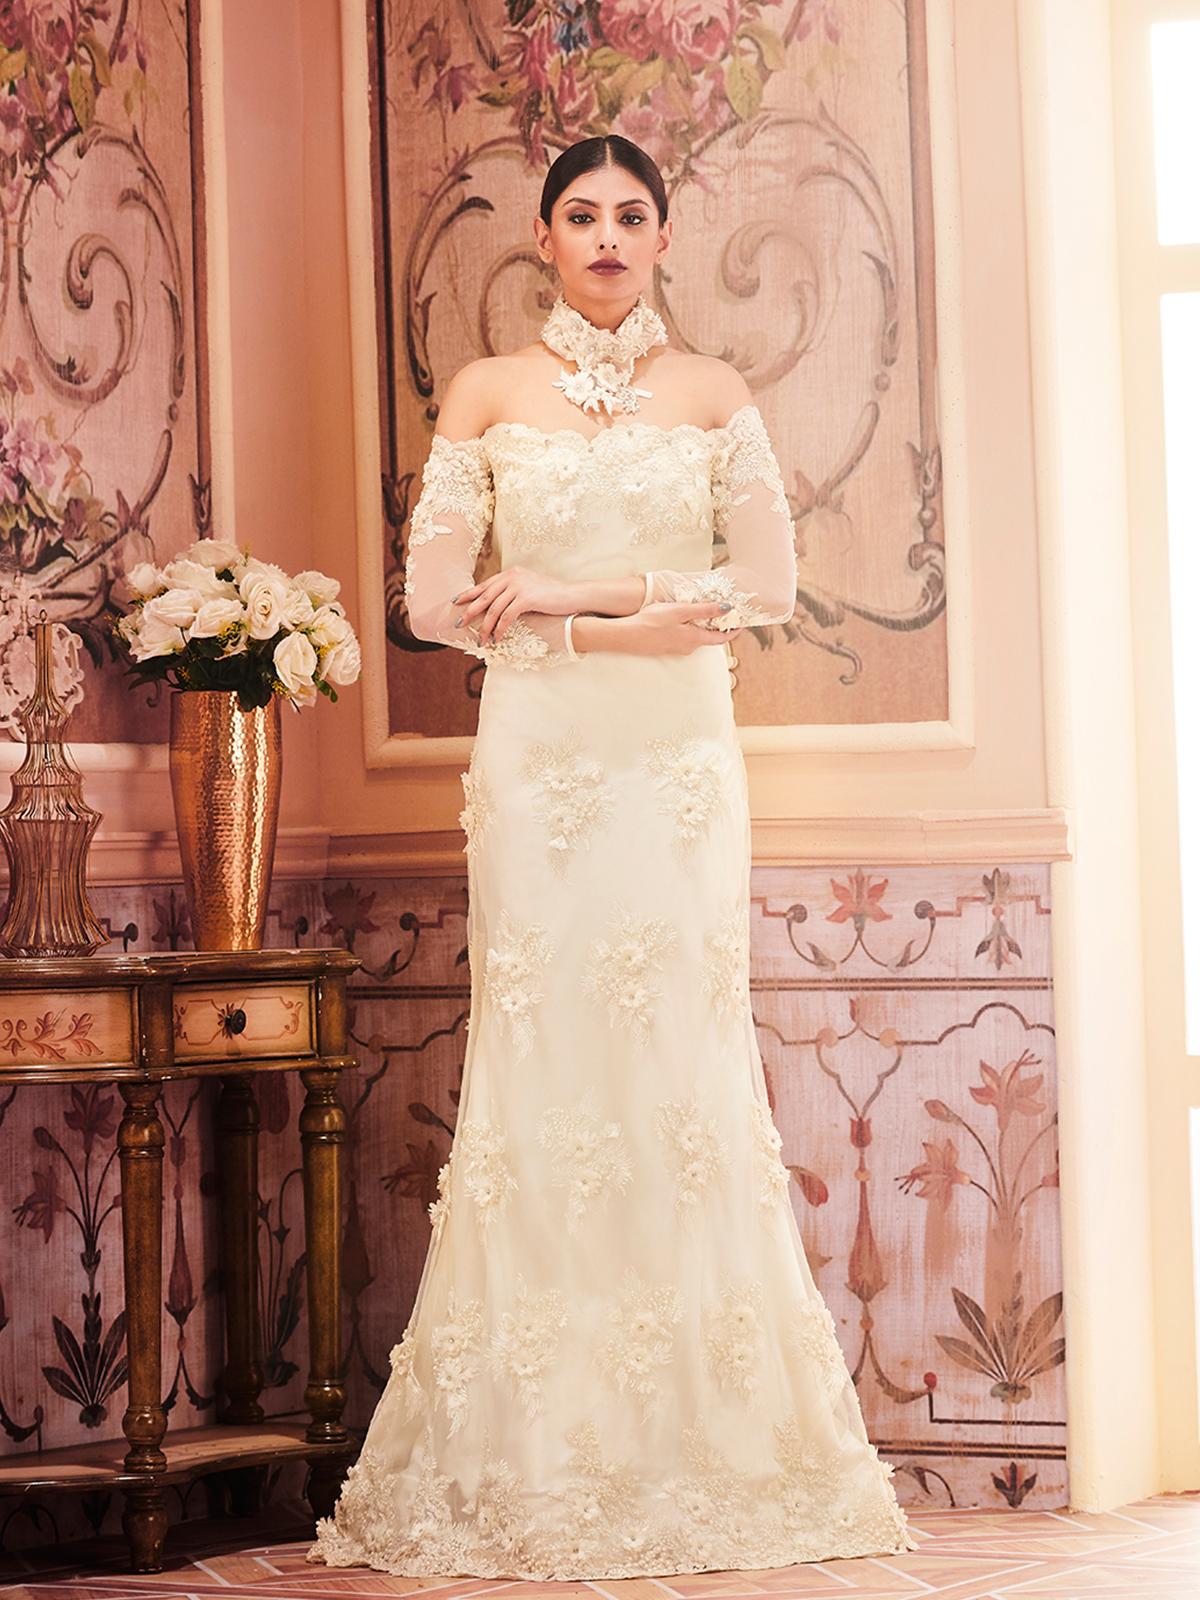 Jual Kleinfeld Off The Shoulder Long Bridesmaid Dress Update 2018 Floral Print Womenamp039s Bohemian Chiffon Maxi Floor Length Indian Wedding Dresses For Girls Designer Bridal Online